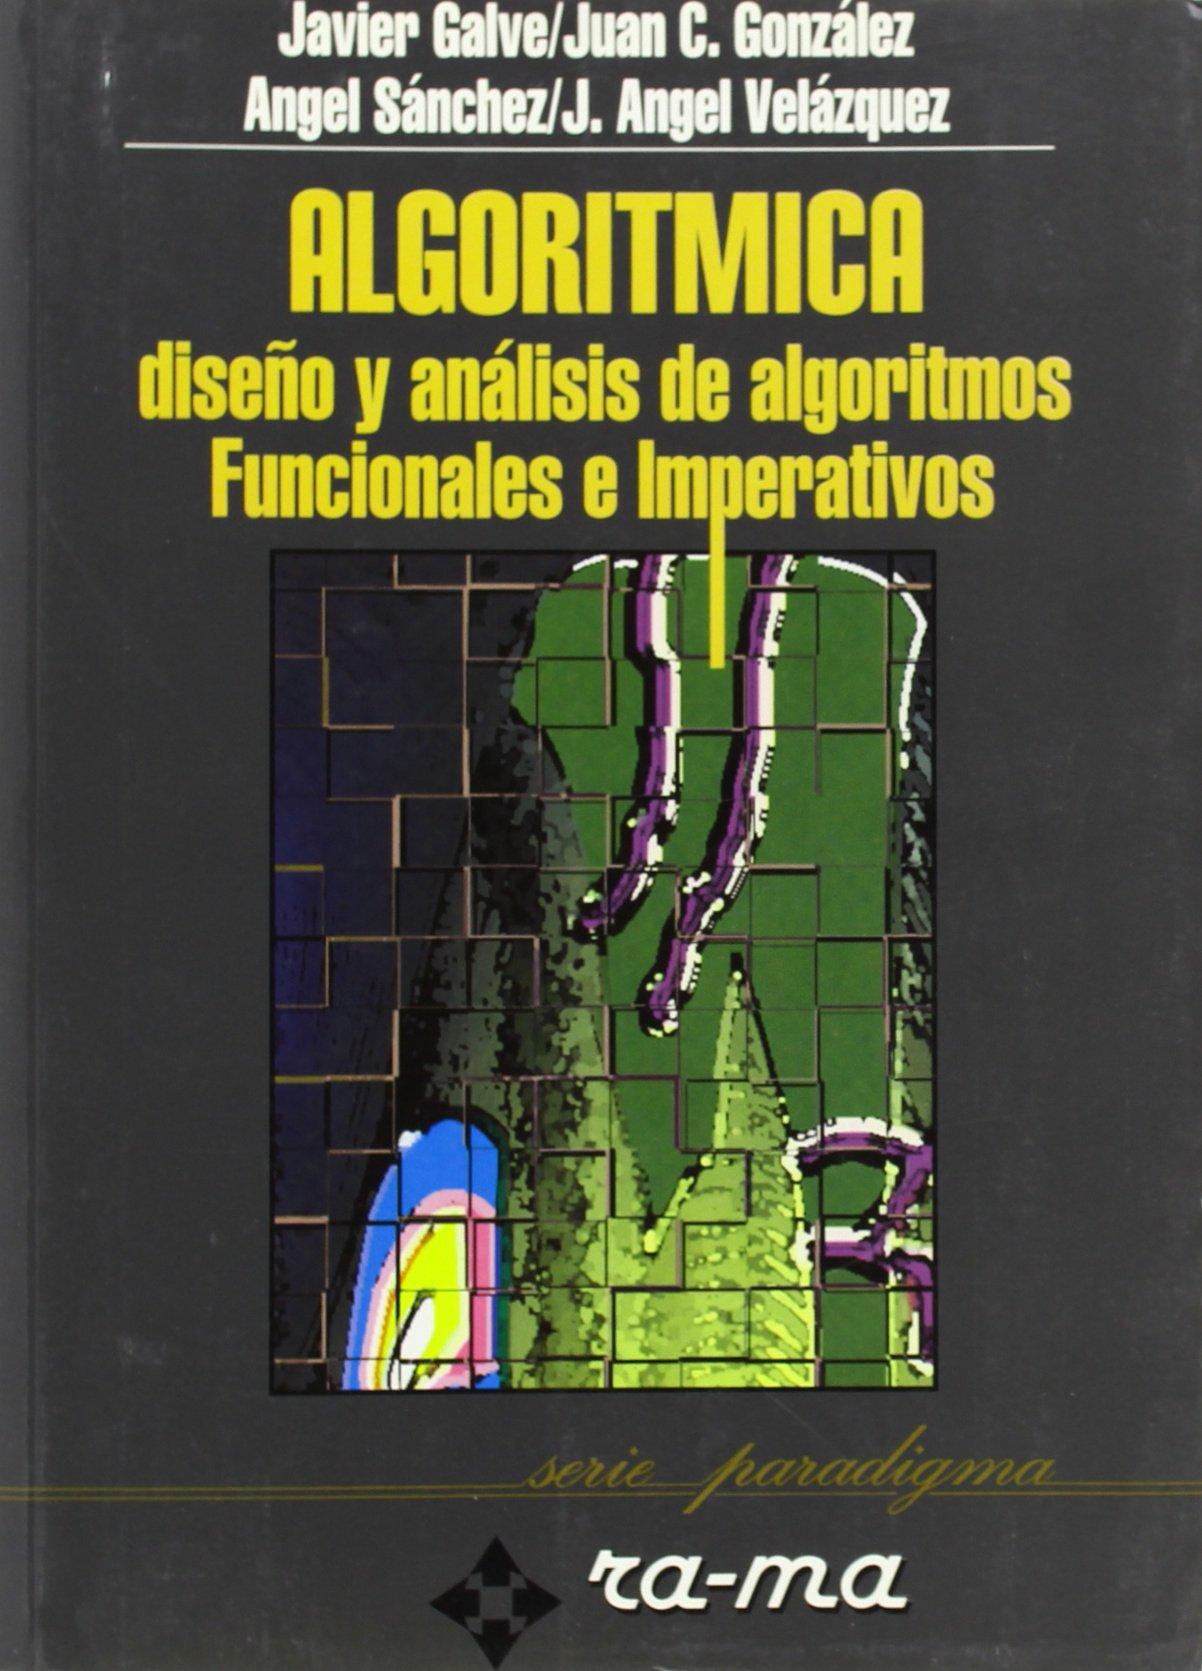 Algorítmica. Diseño y análisis de algoritmos Funcionales e imperativos. Tapa blanda – 15 sep 1993 Galve González Sanchez Velazquez